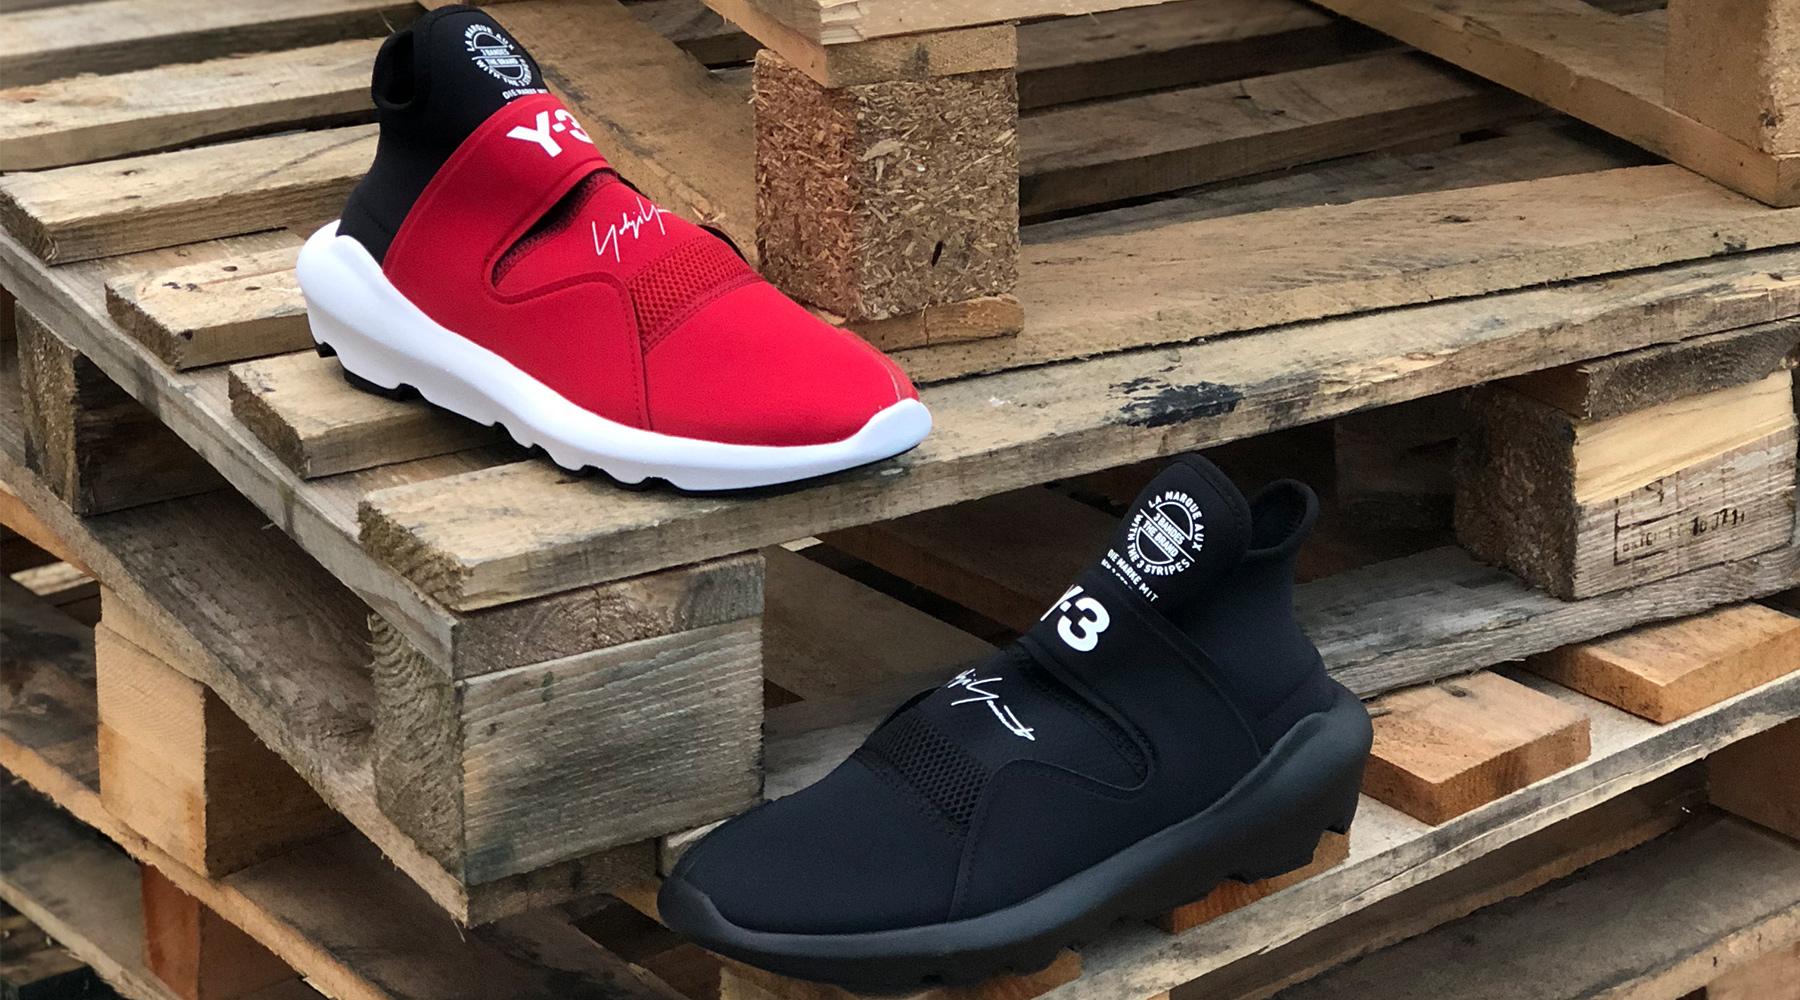 Adidas Y-3 Releases